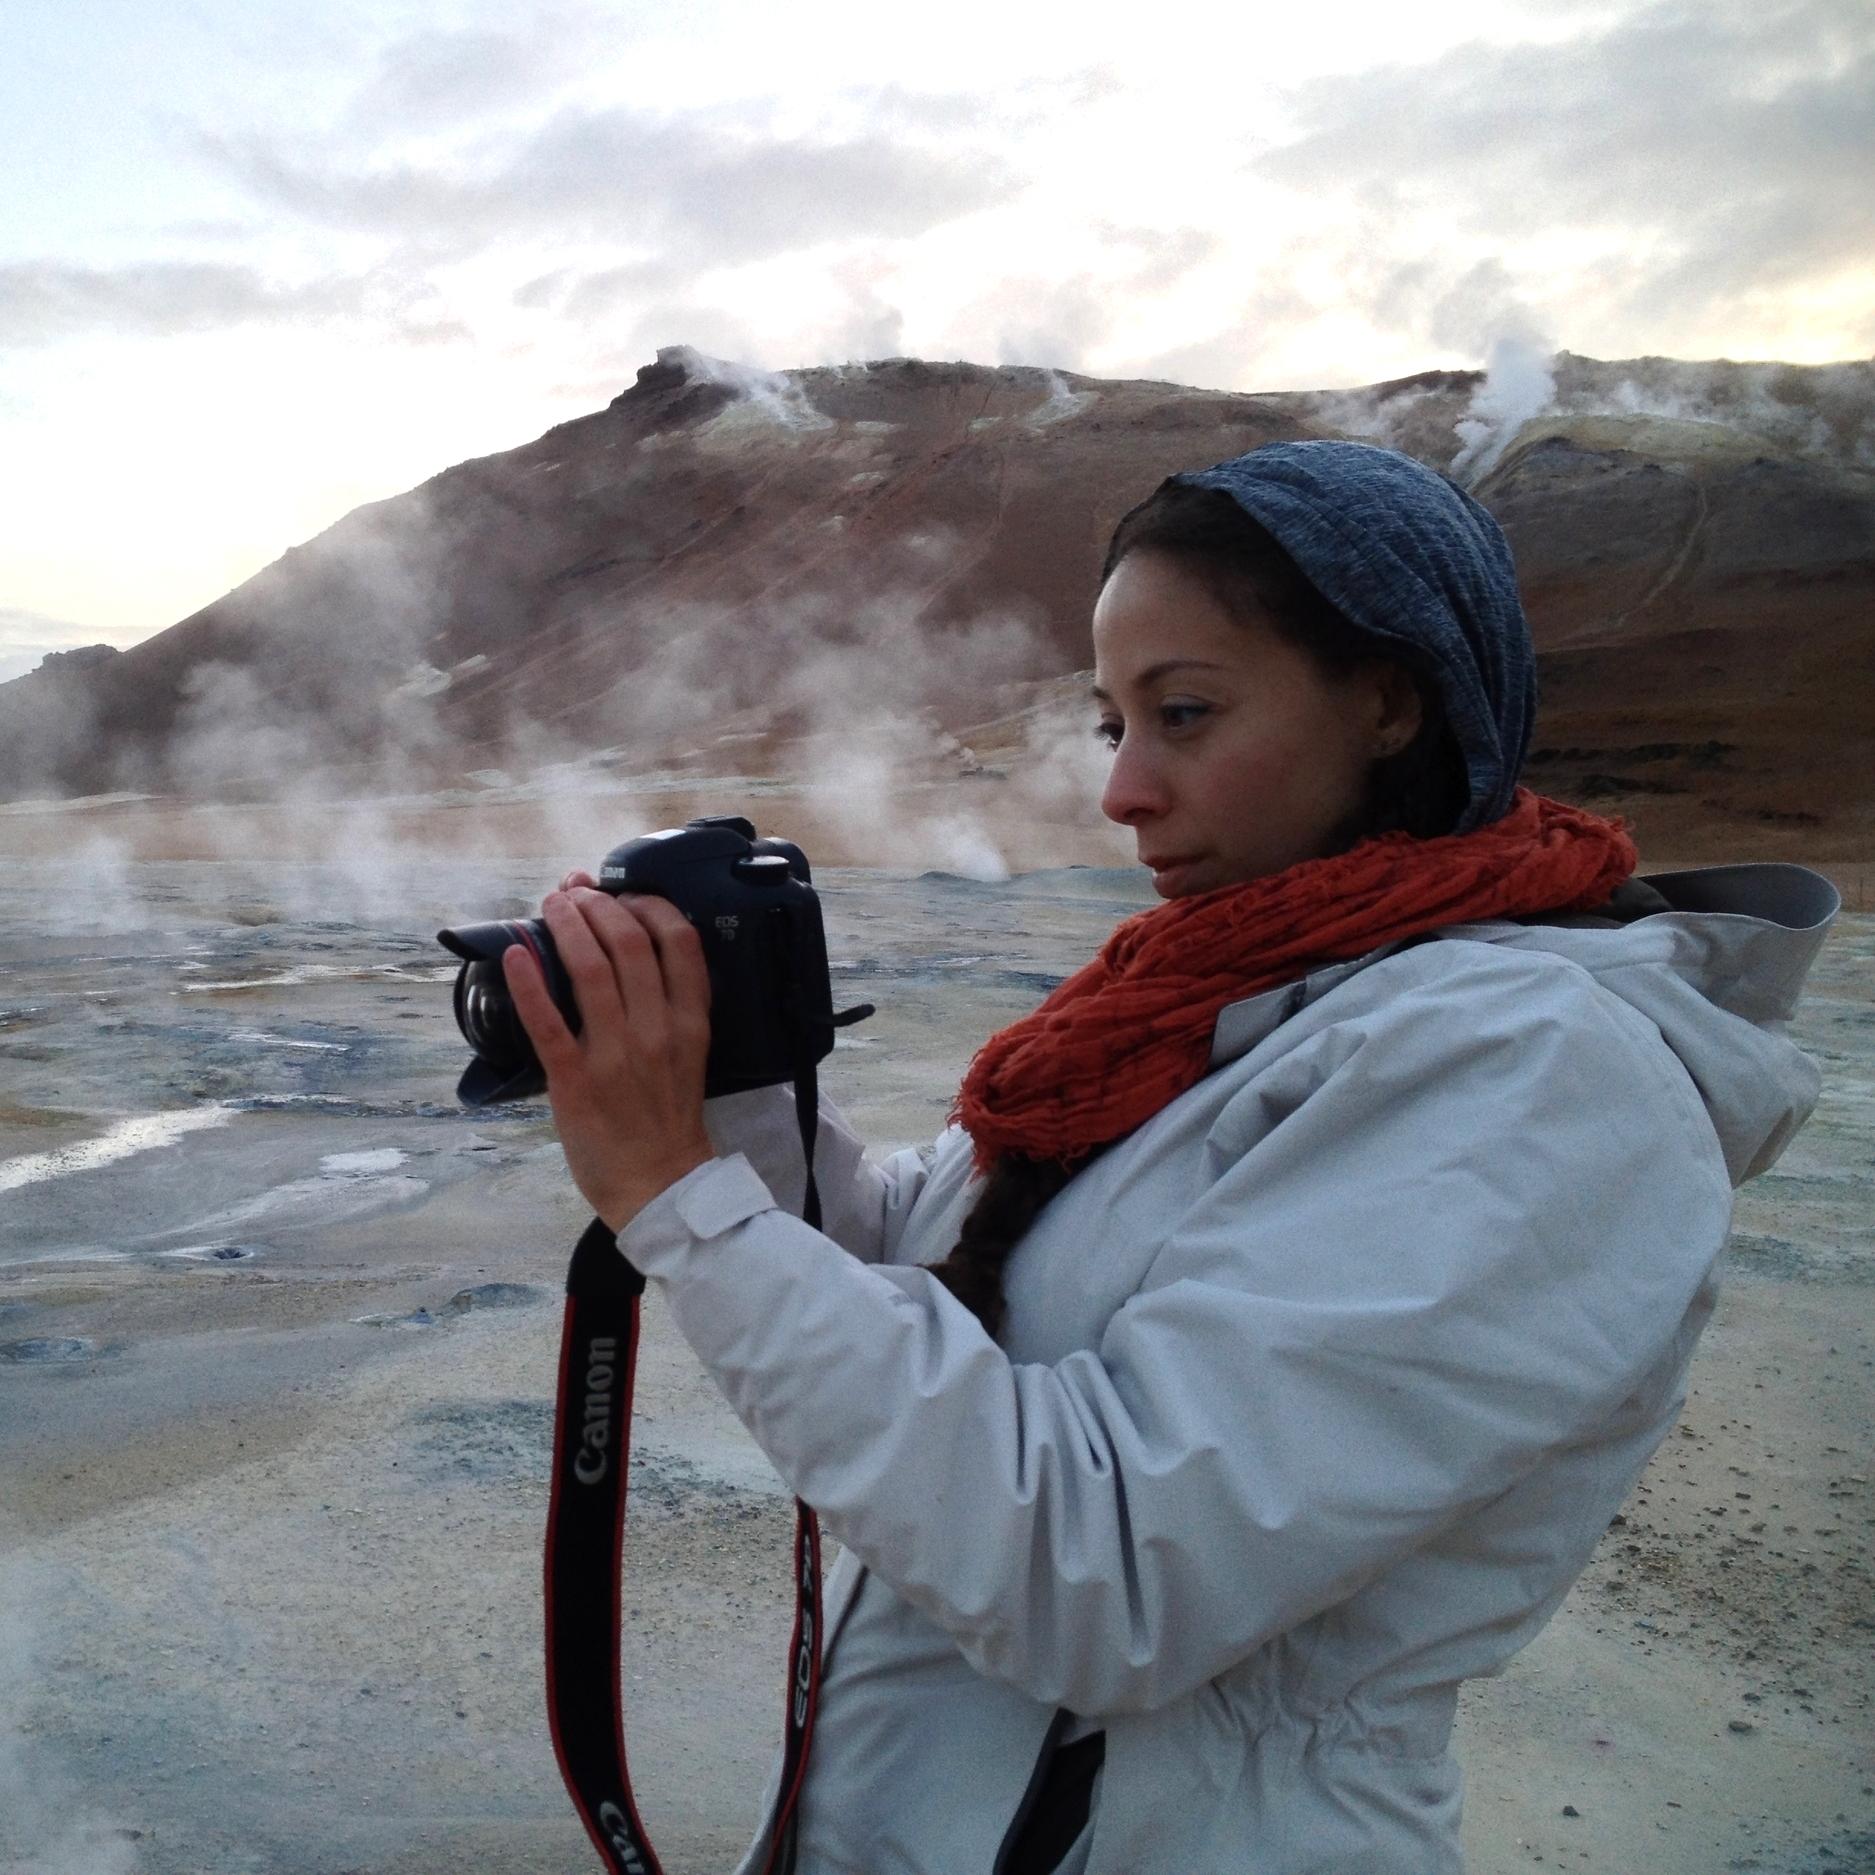 NASA Cinematographer Nasreen Alkhateeb capturing sulphuric landscape in Iceland